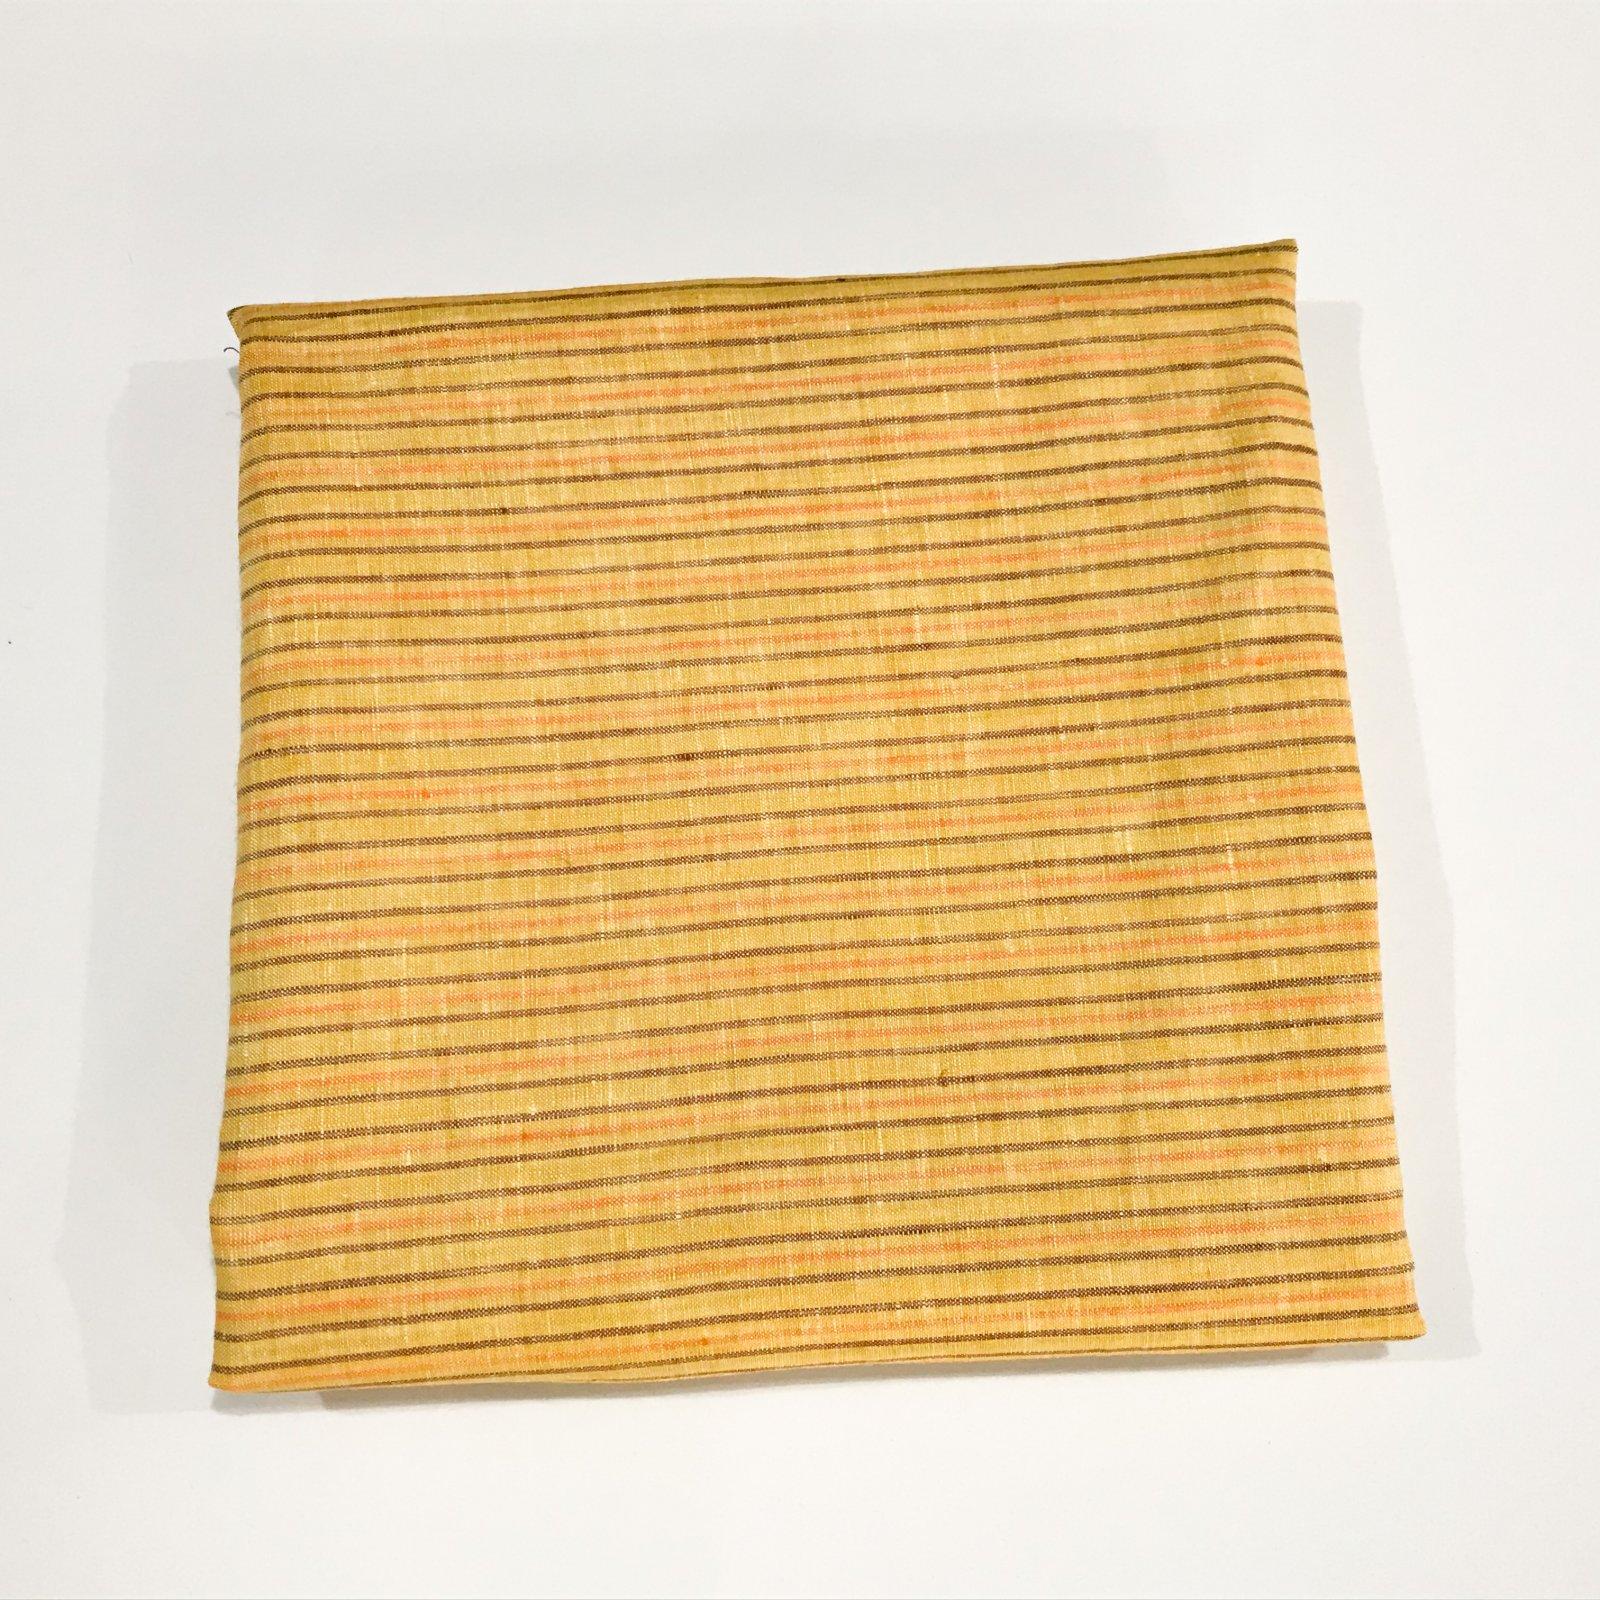 2 yards + 7 inches - Linen - Yellow/Rust/Orange Stripes